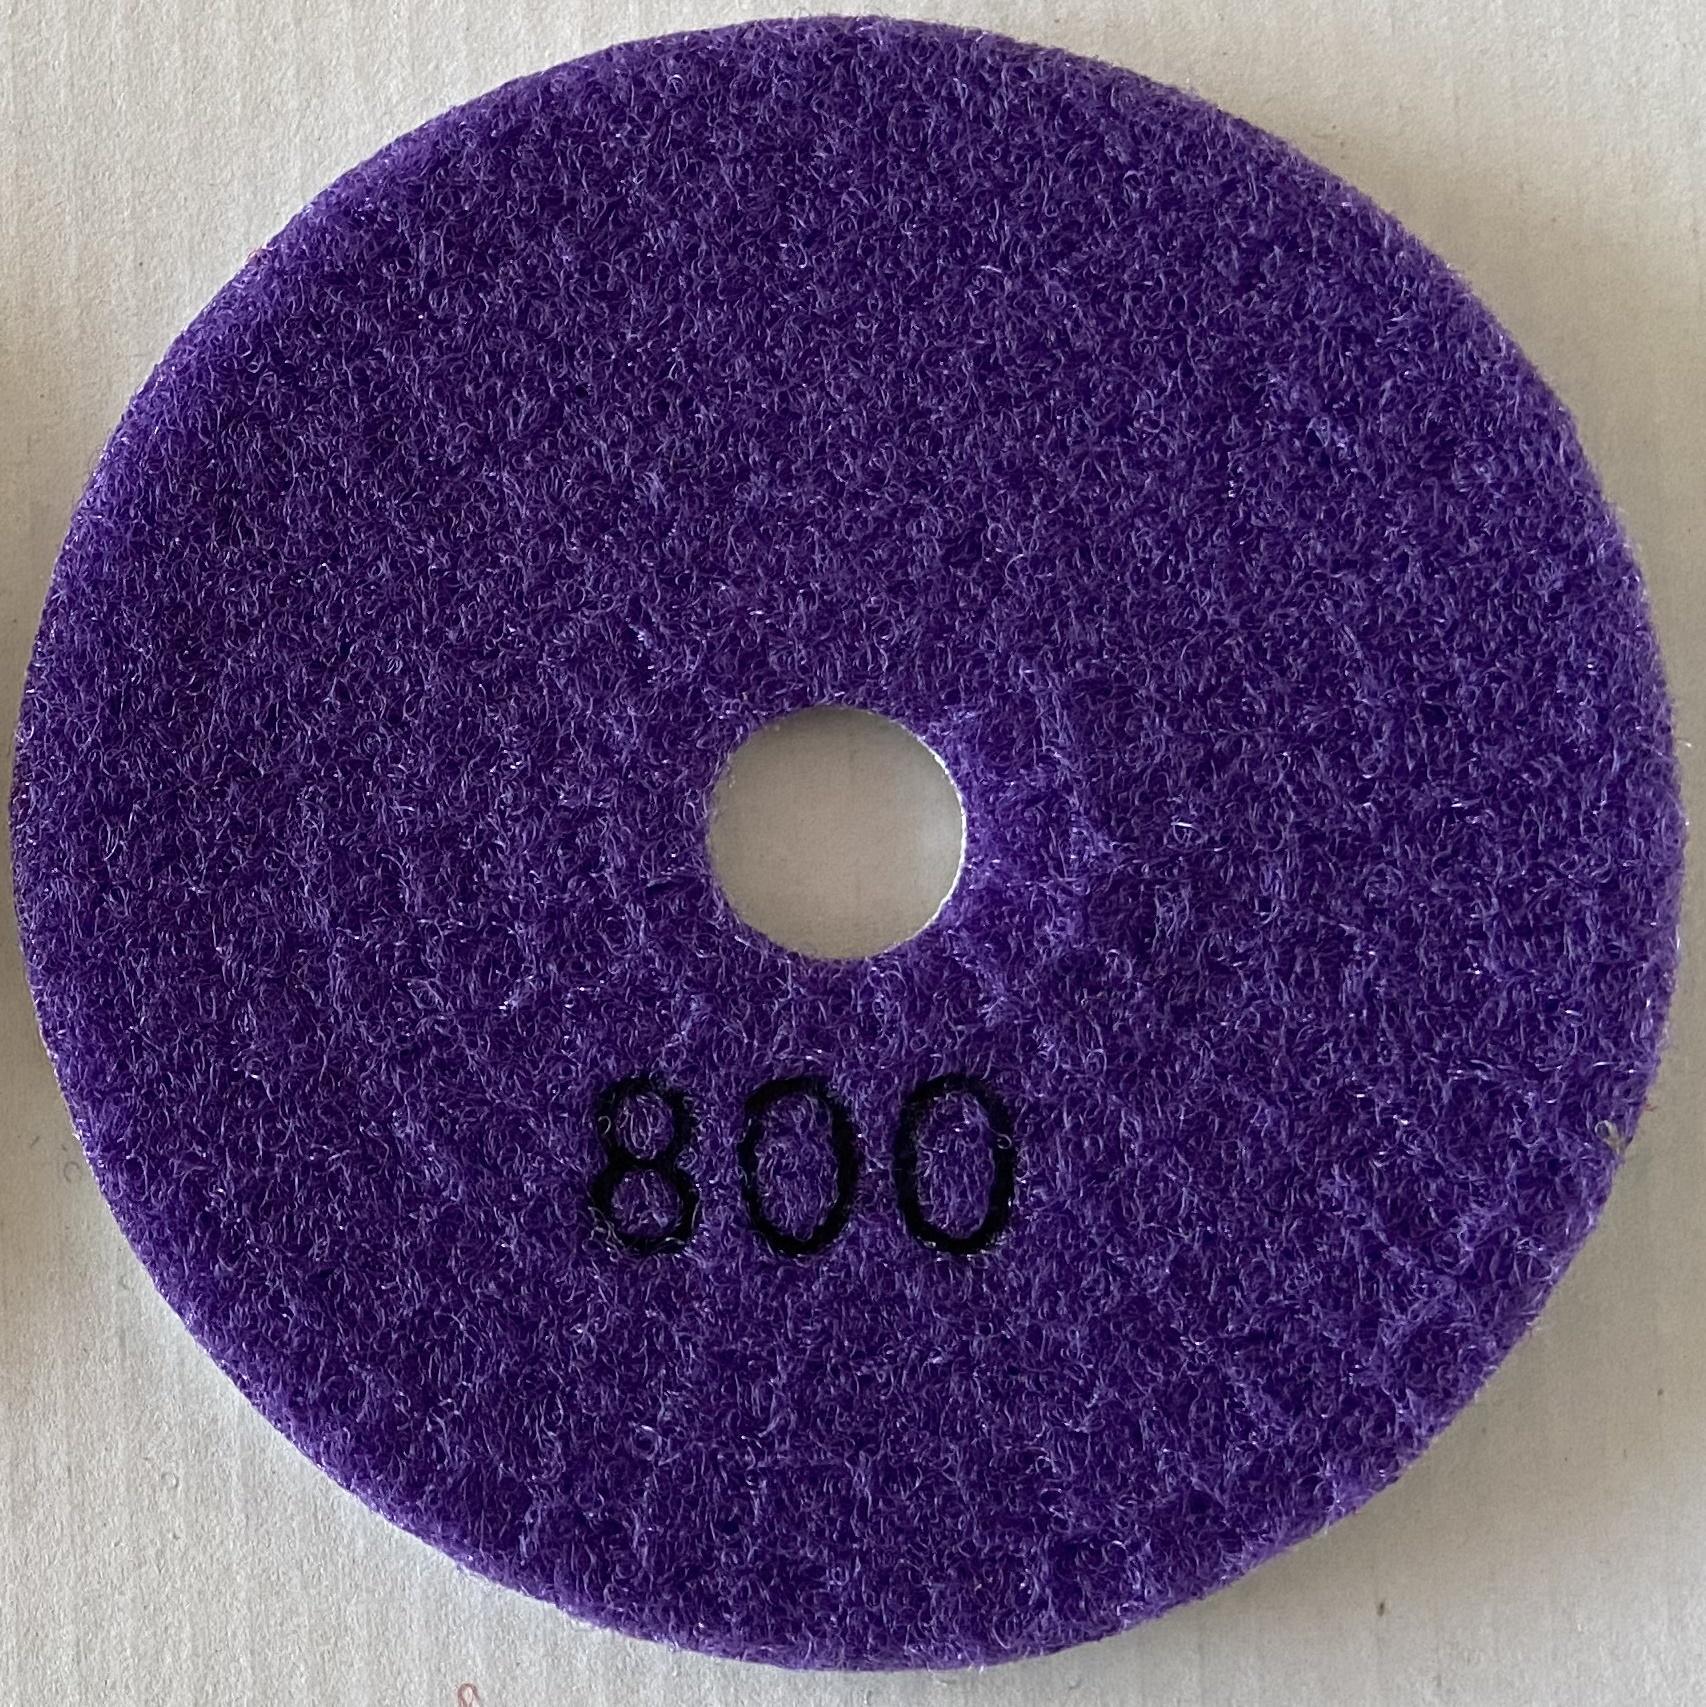 Pad 801